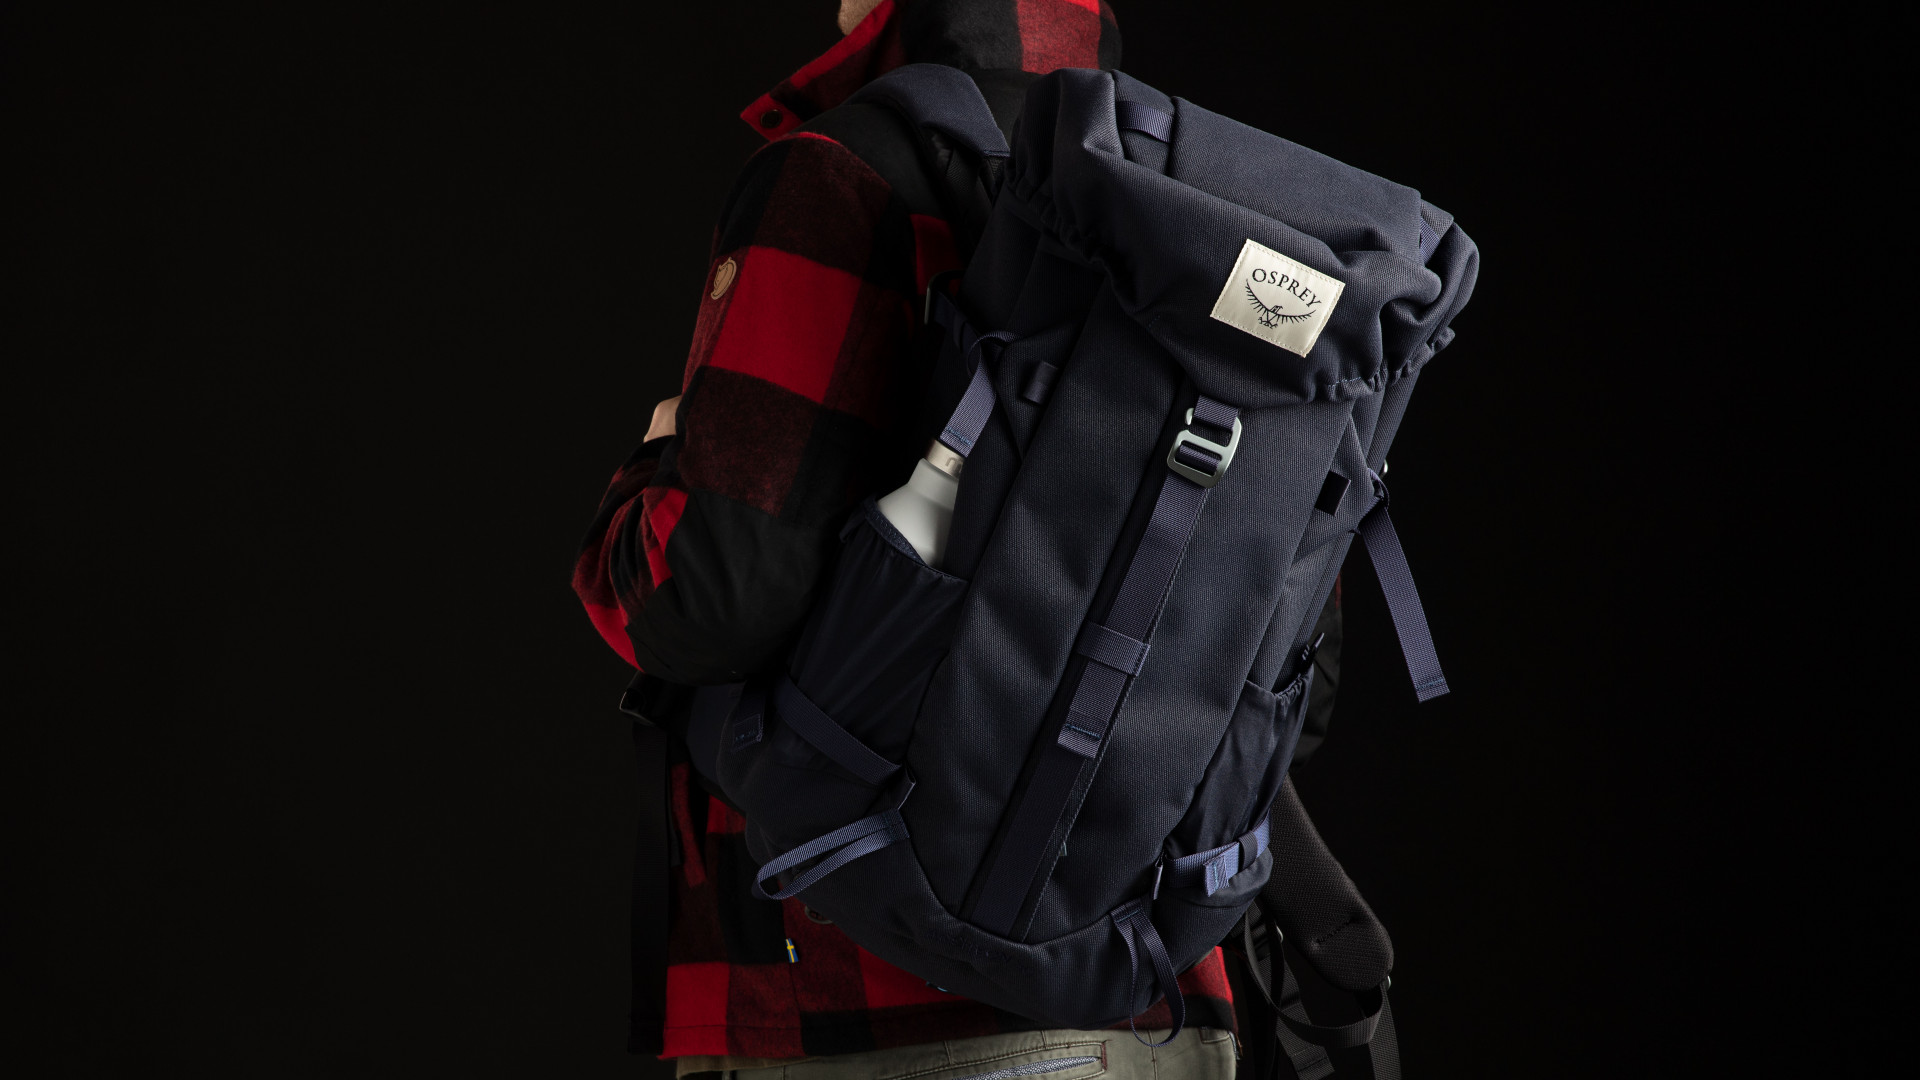 Osprey Archeon 30 women's backpack | side view